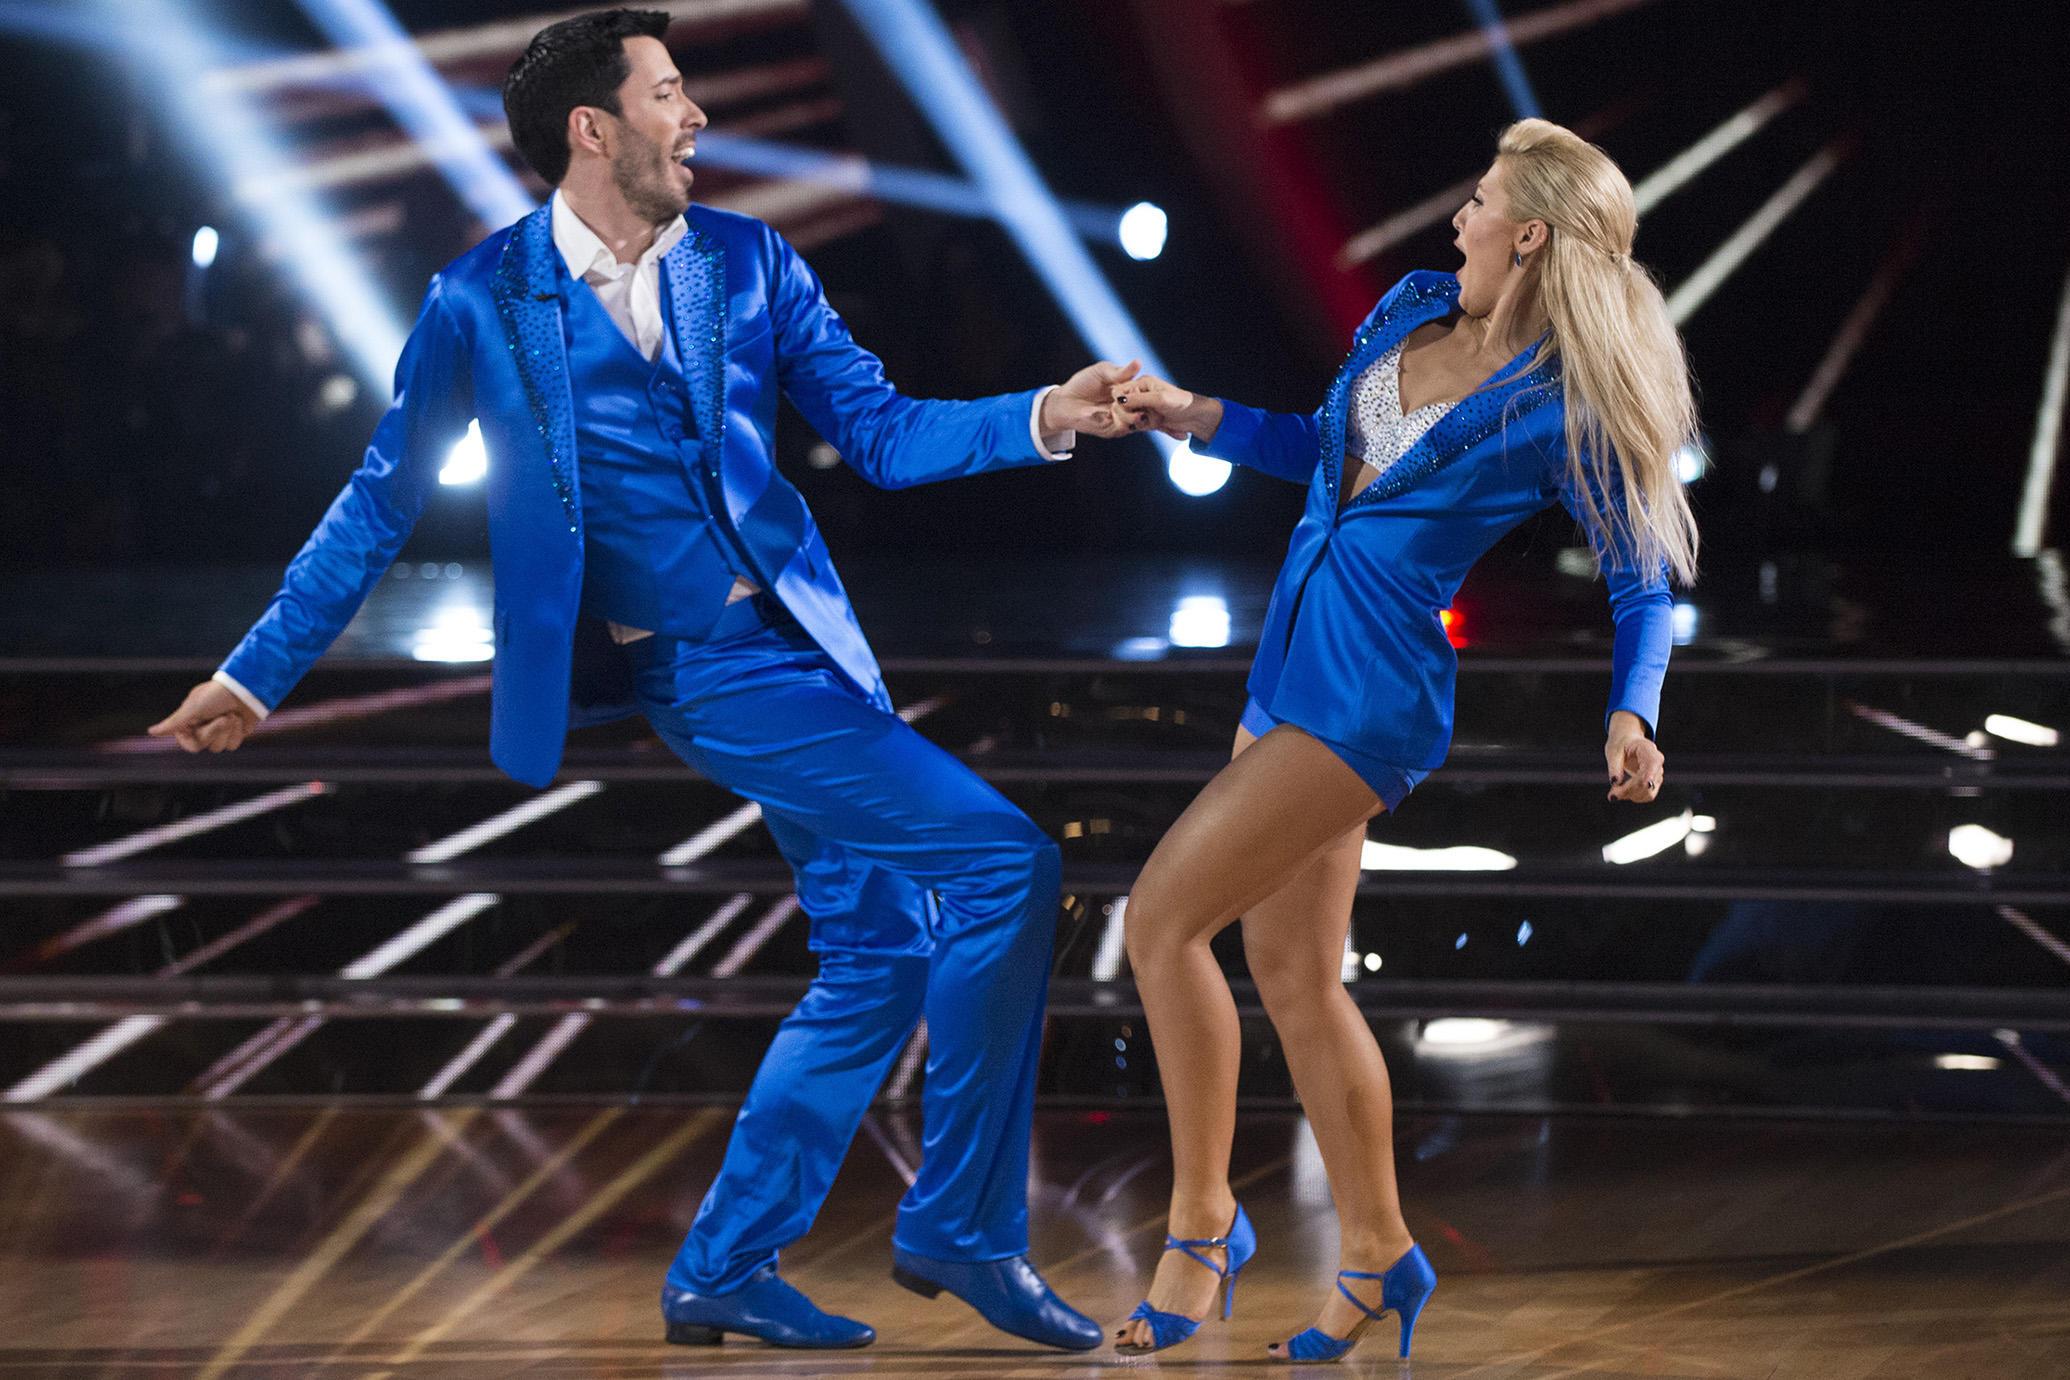 Drew Scott and Emma Slate dancing in blue costumes